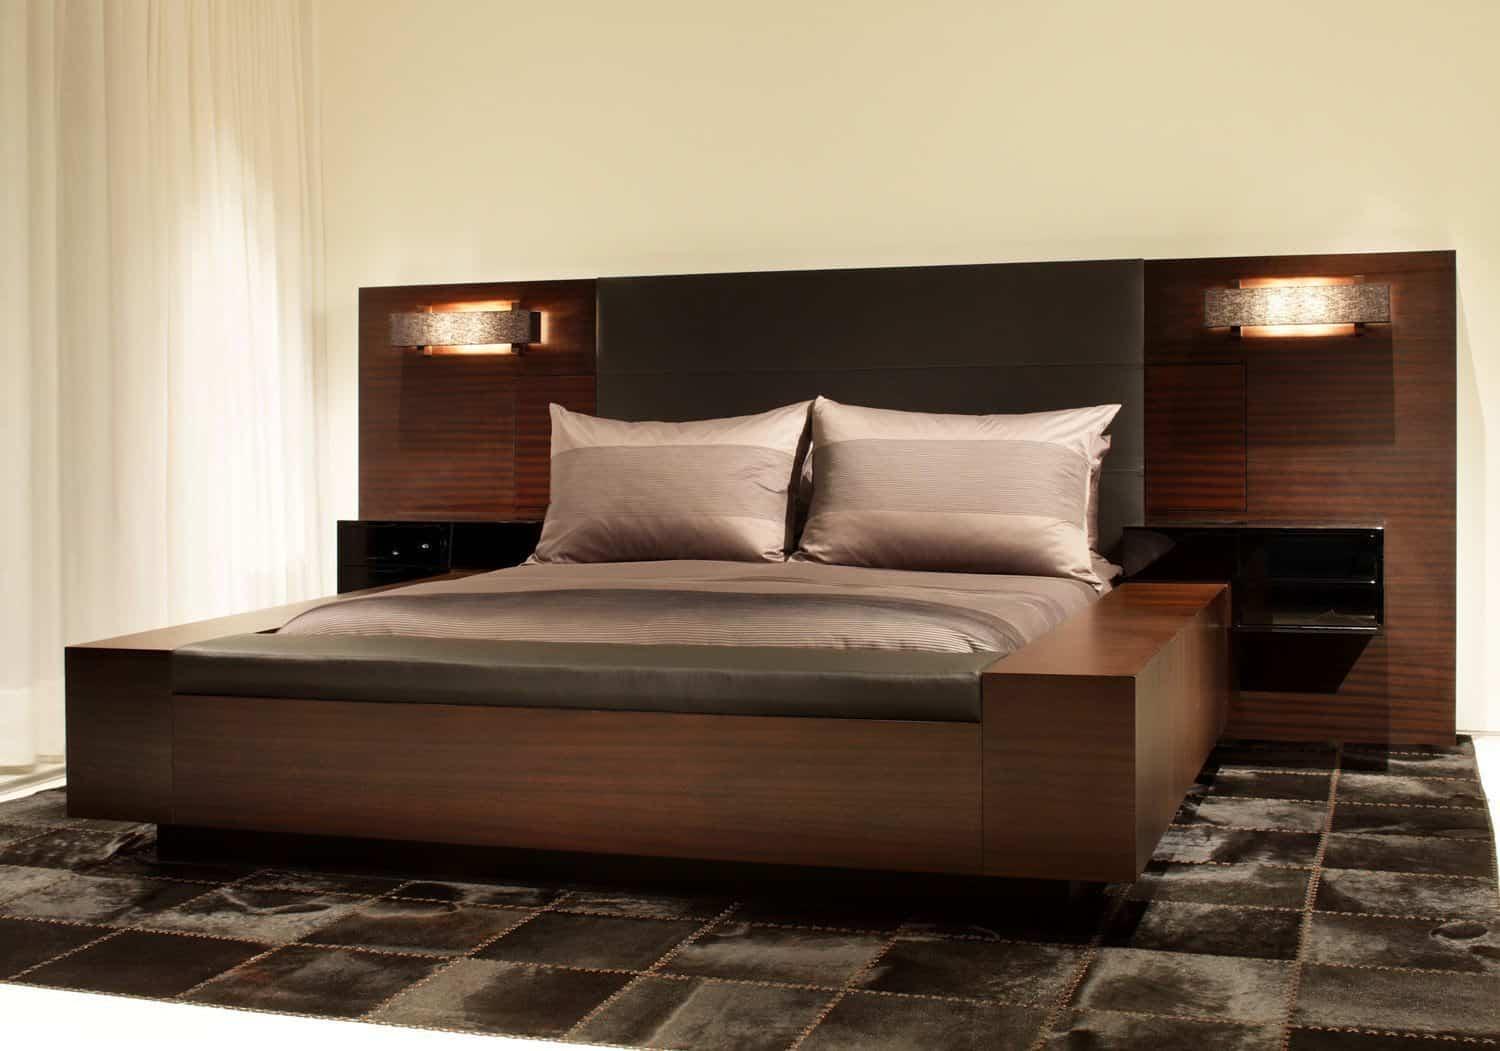 Modern-Residence-Architecture-Magni Design-26-1 Kindesign